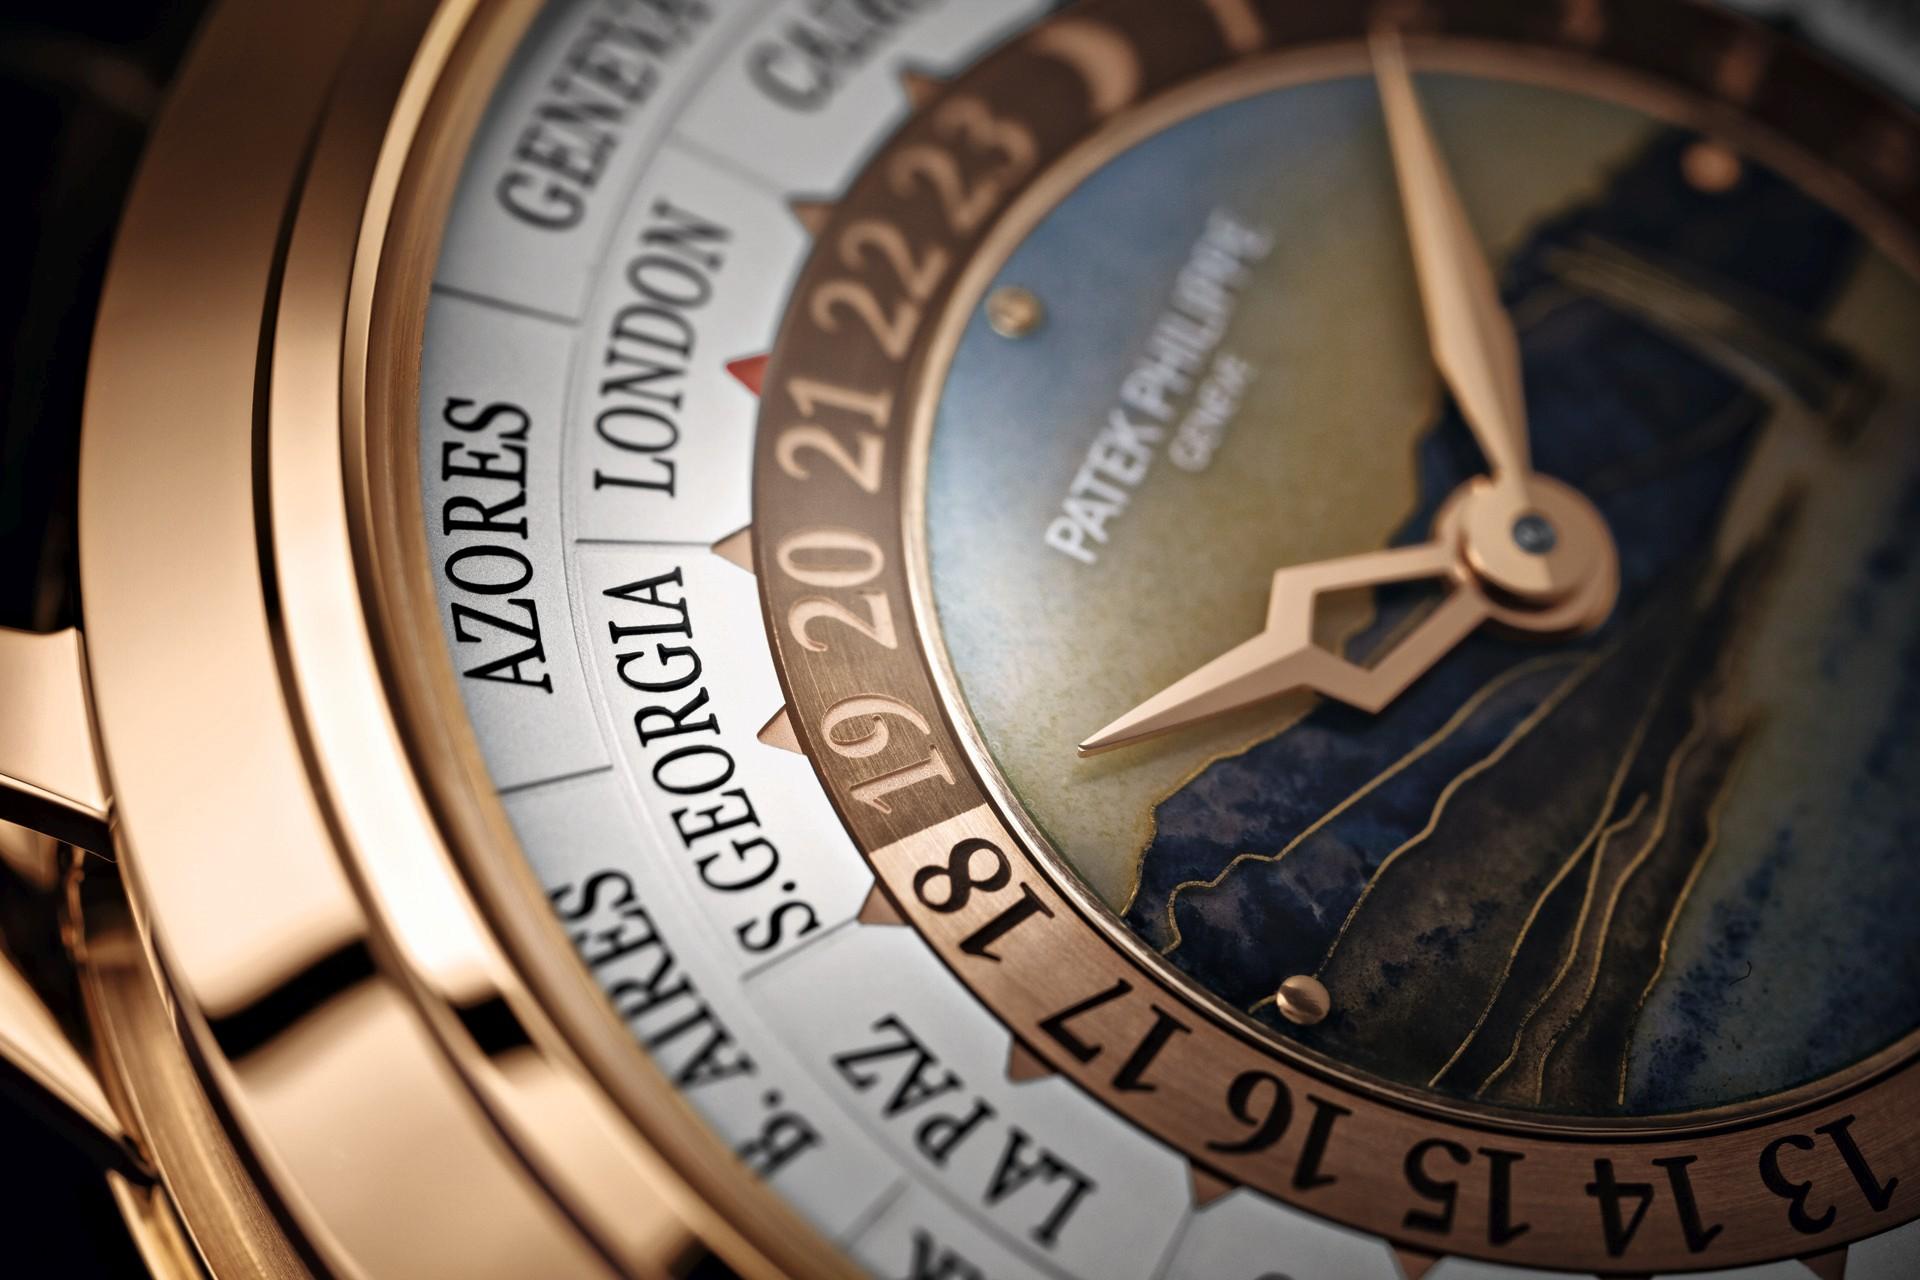 【Baselworld 2018錶展報導】五分鐘完全掌握Patek Philippe全新錶款